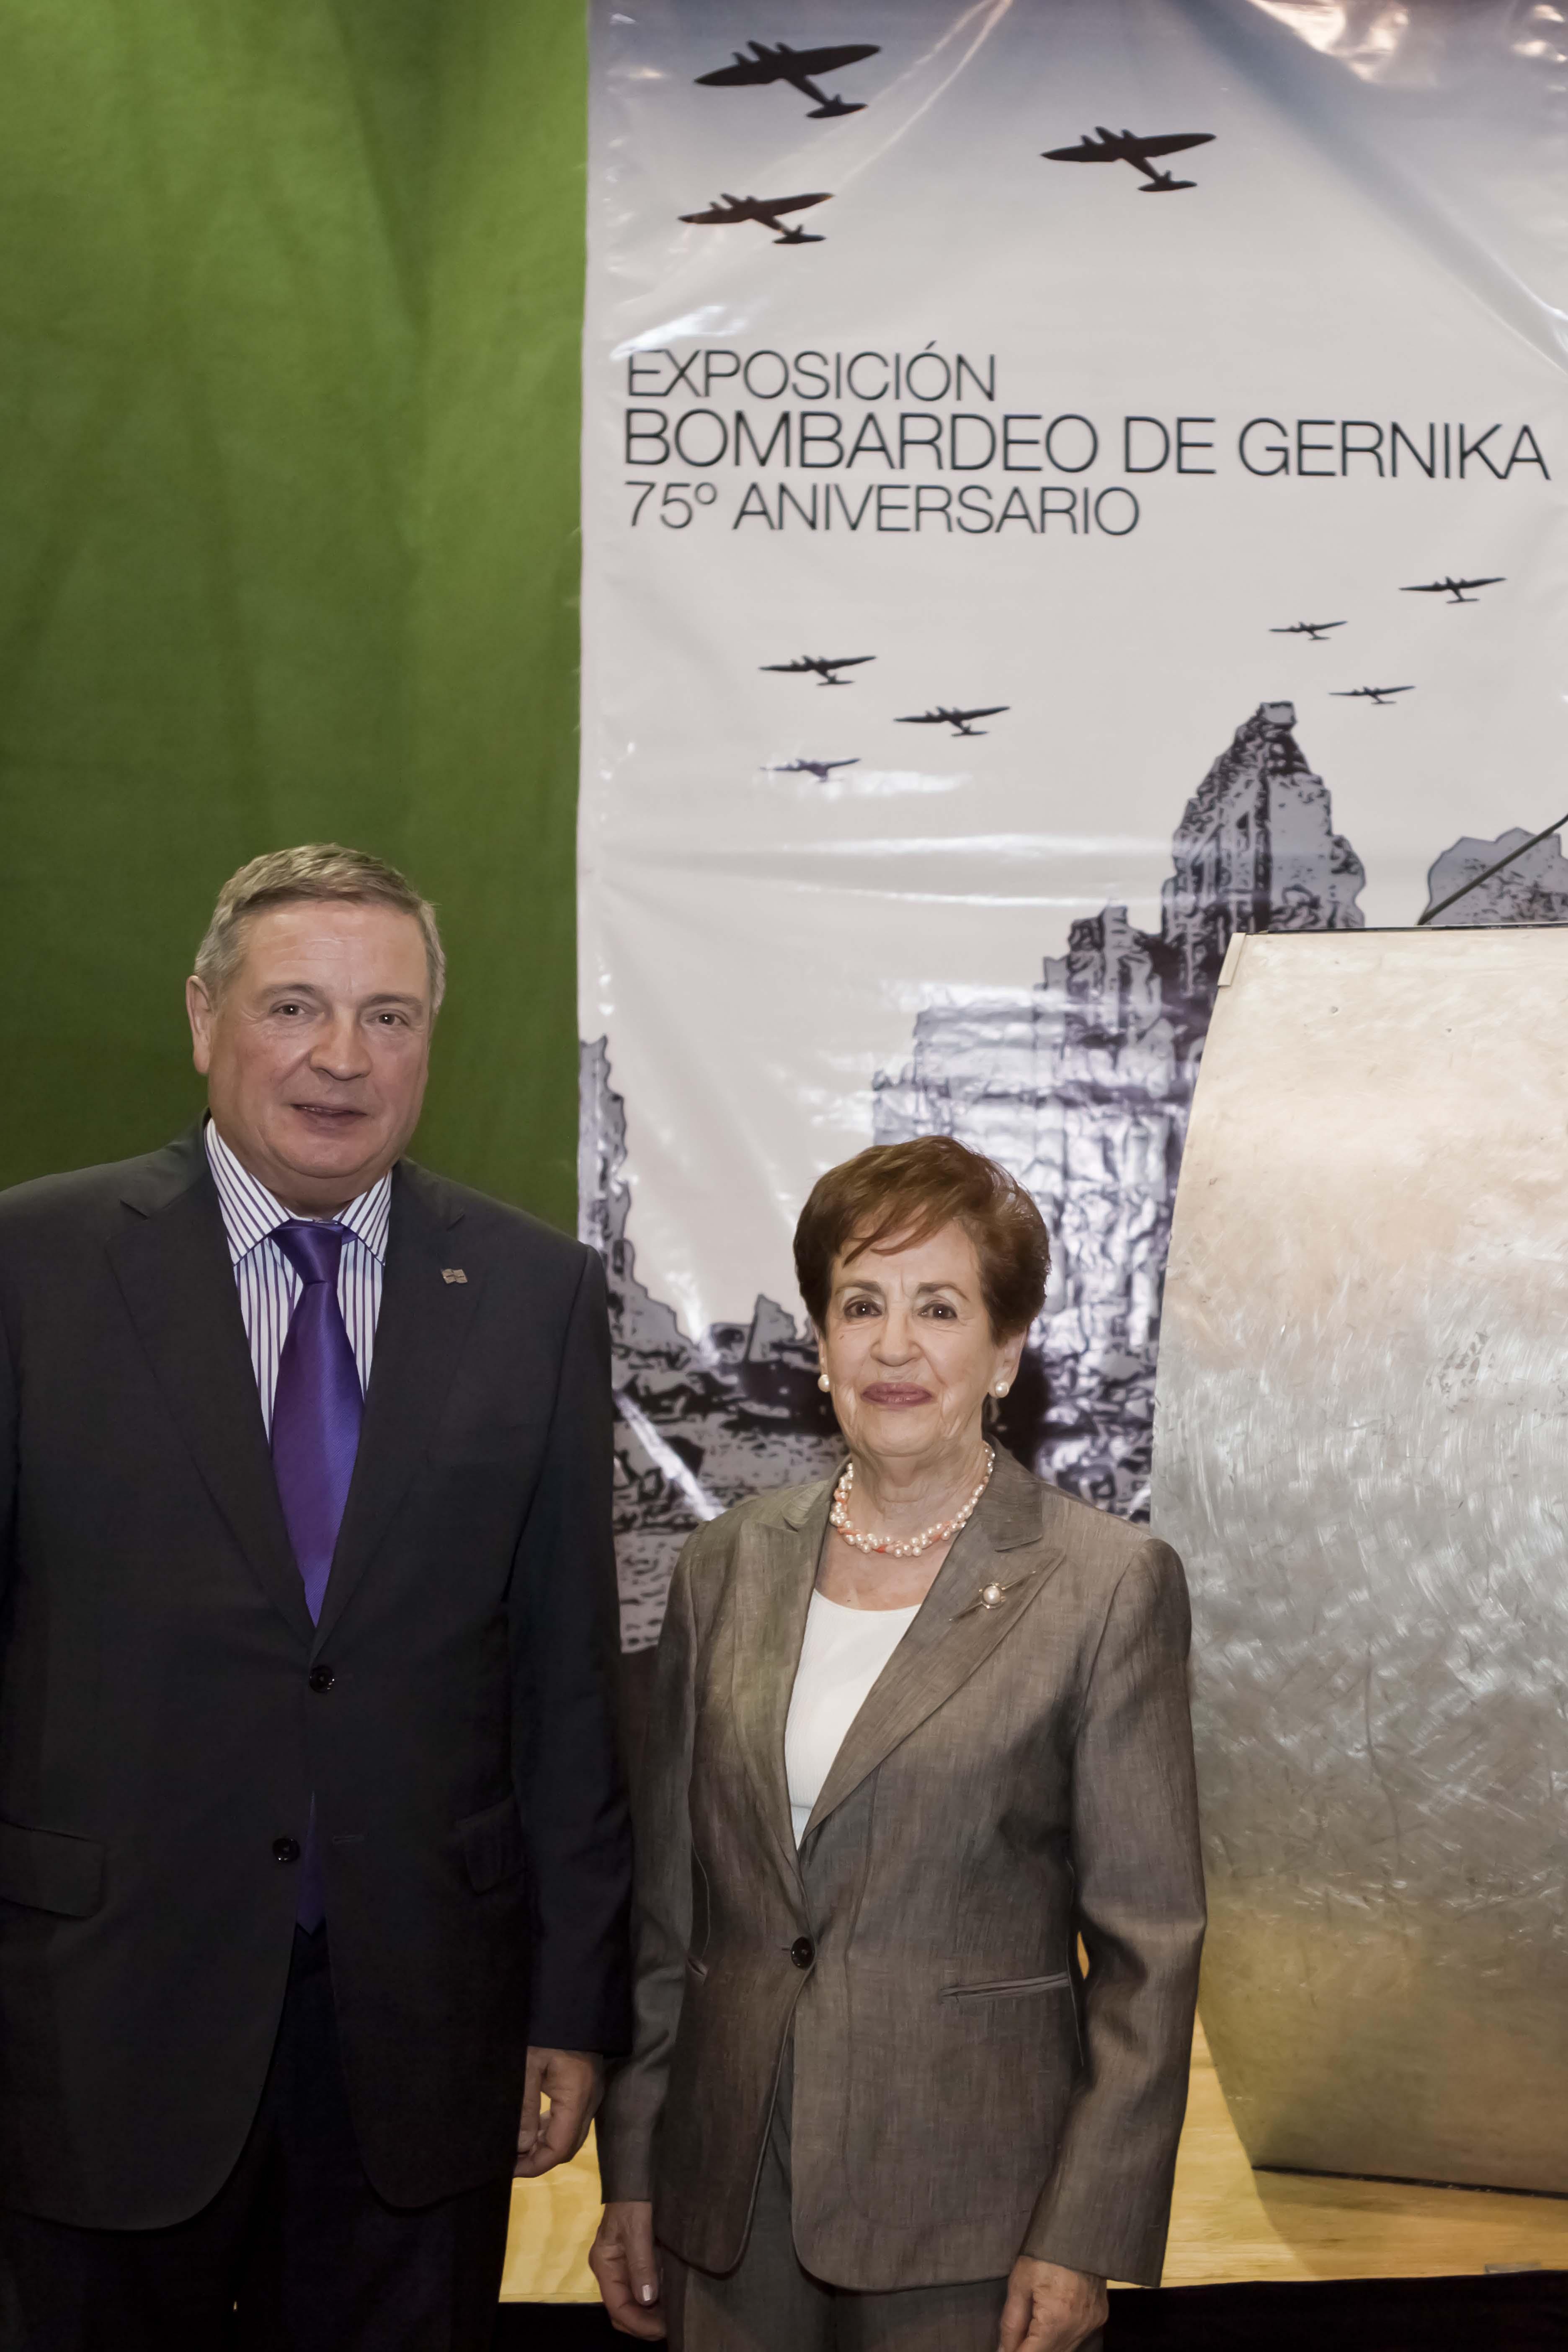 expo_bombardeo_gernika_2.jpg